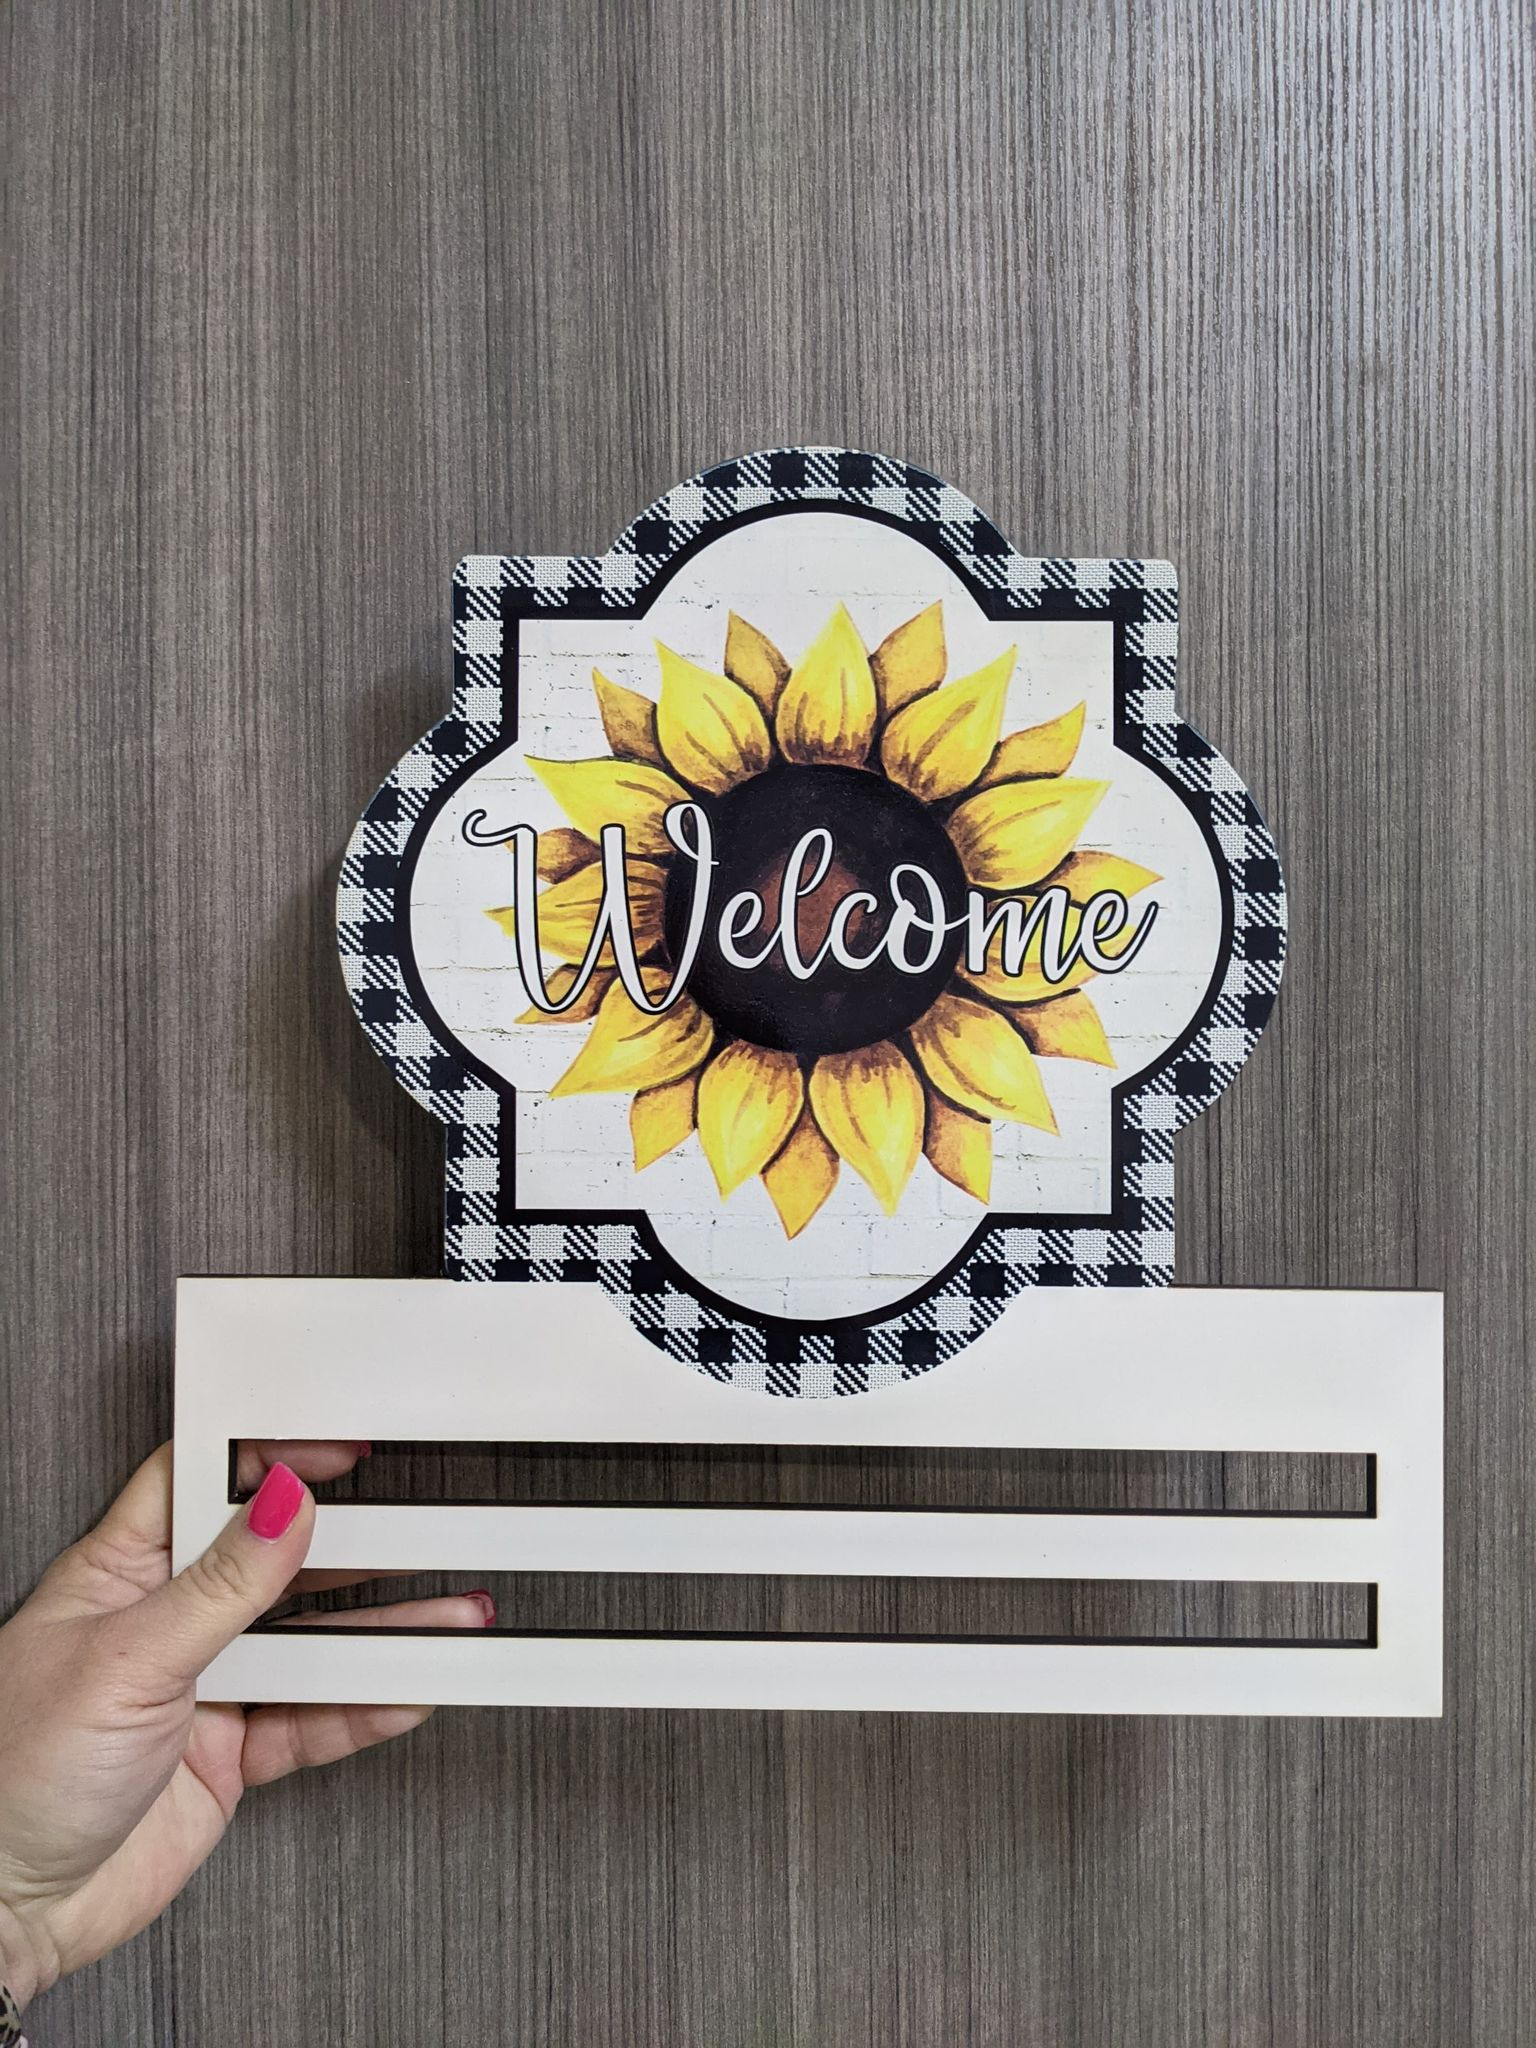 Welcome Sunflower wreath rail